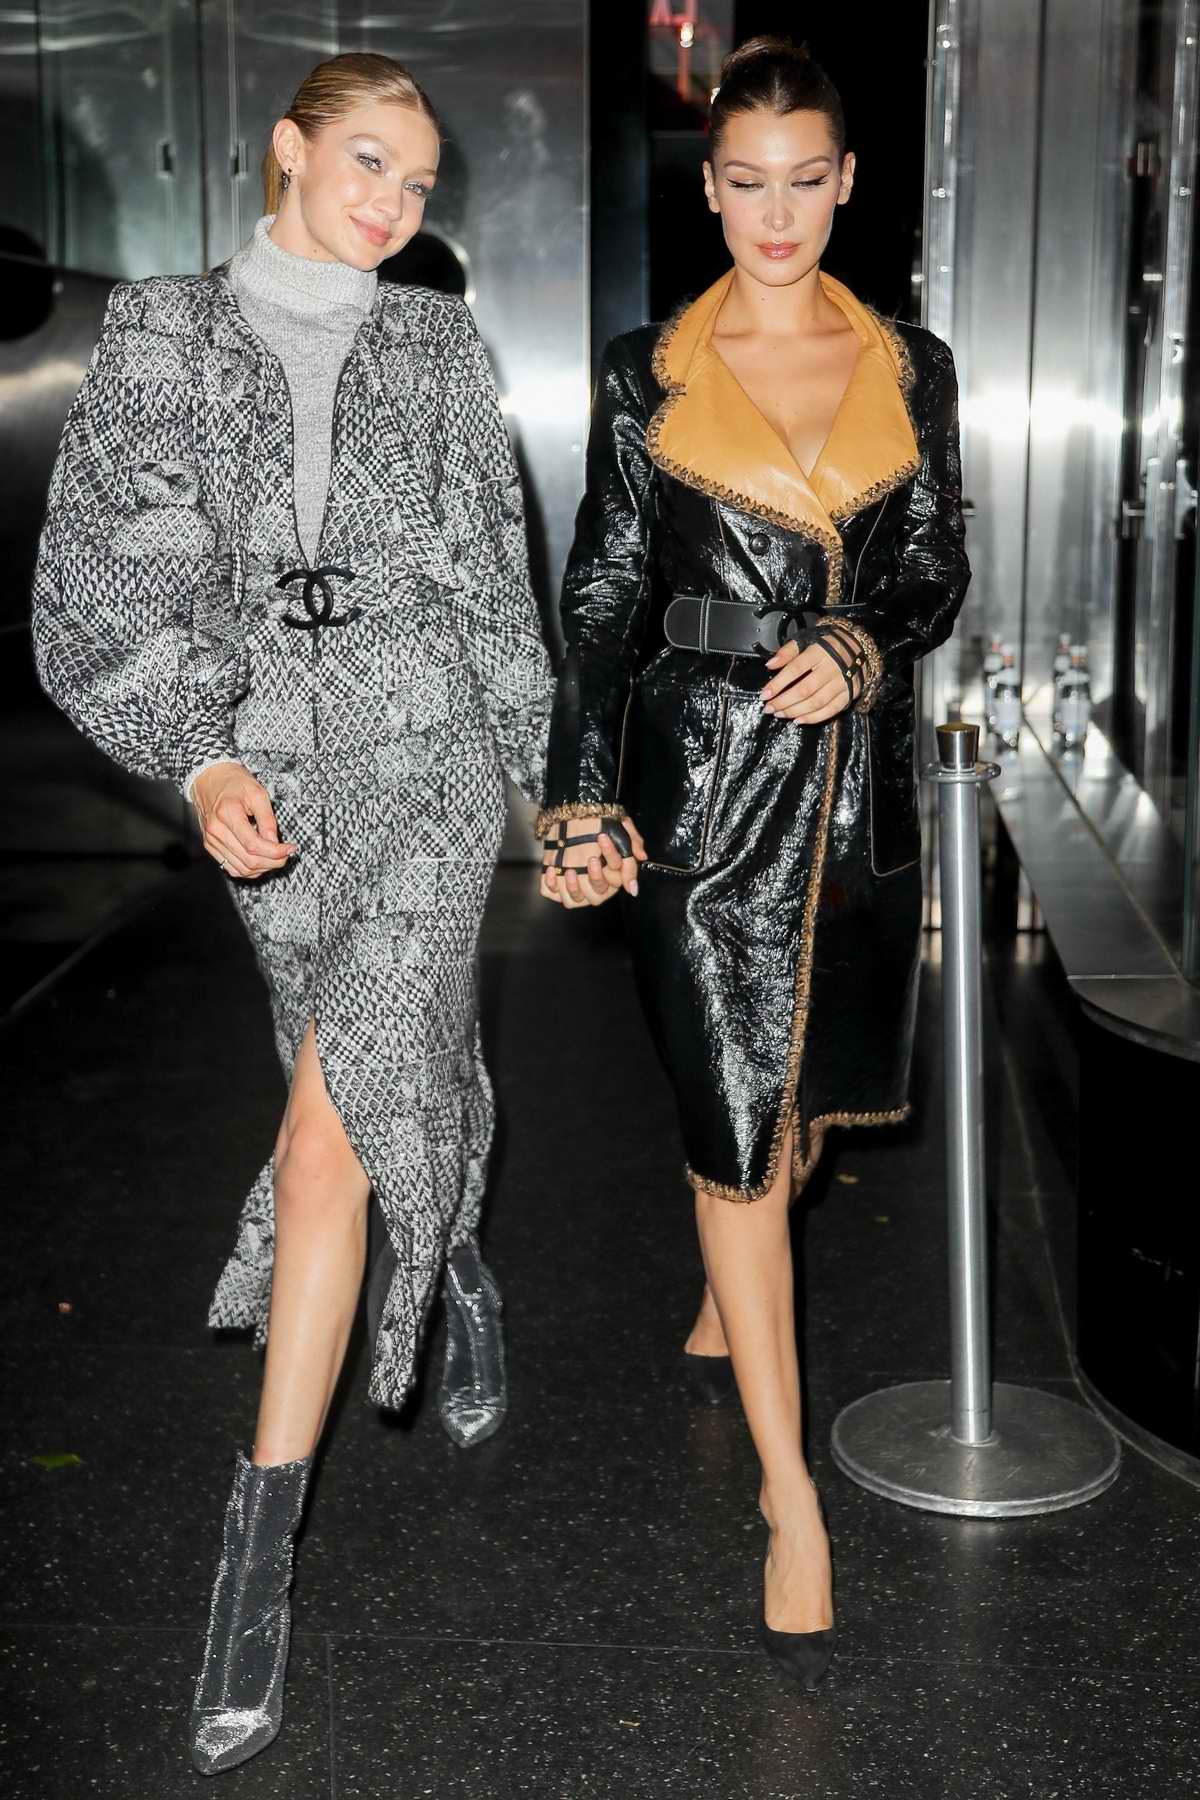 Gigi Hadid and Bella Hadid leaving V Magazine dinner in honor of Karl Lagerfeld in New York City